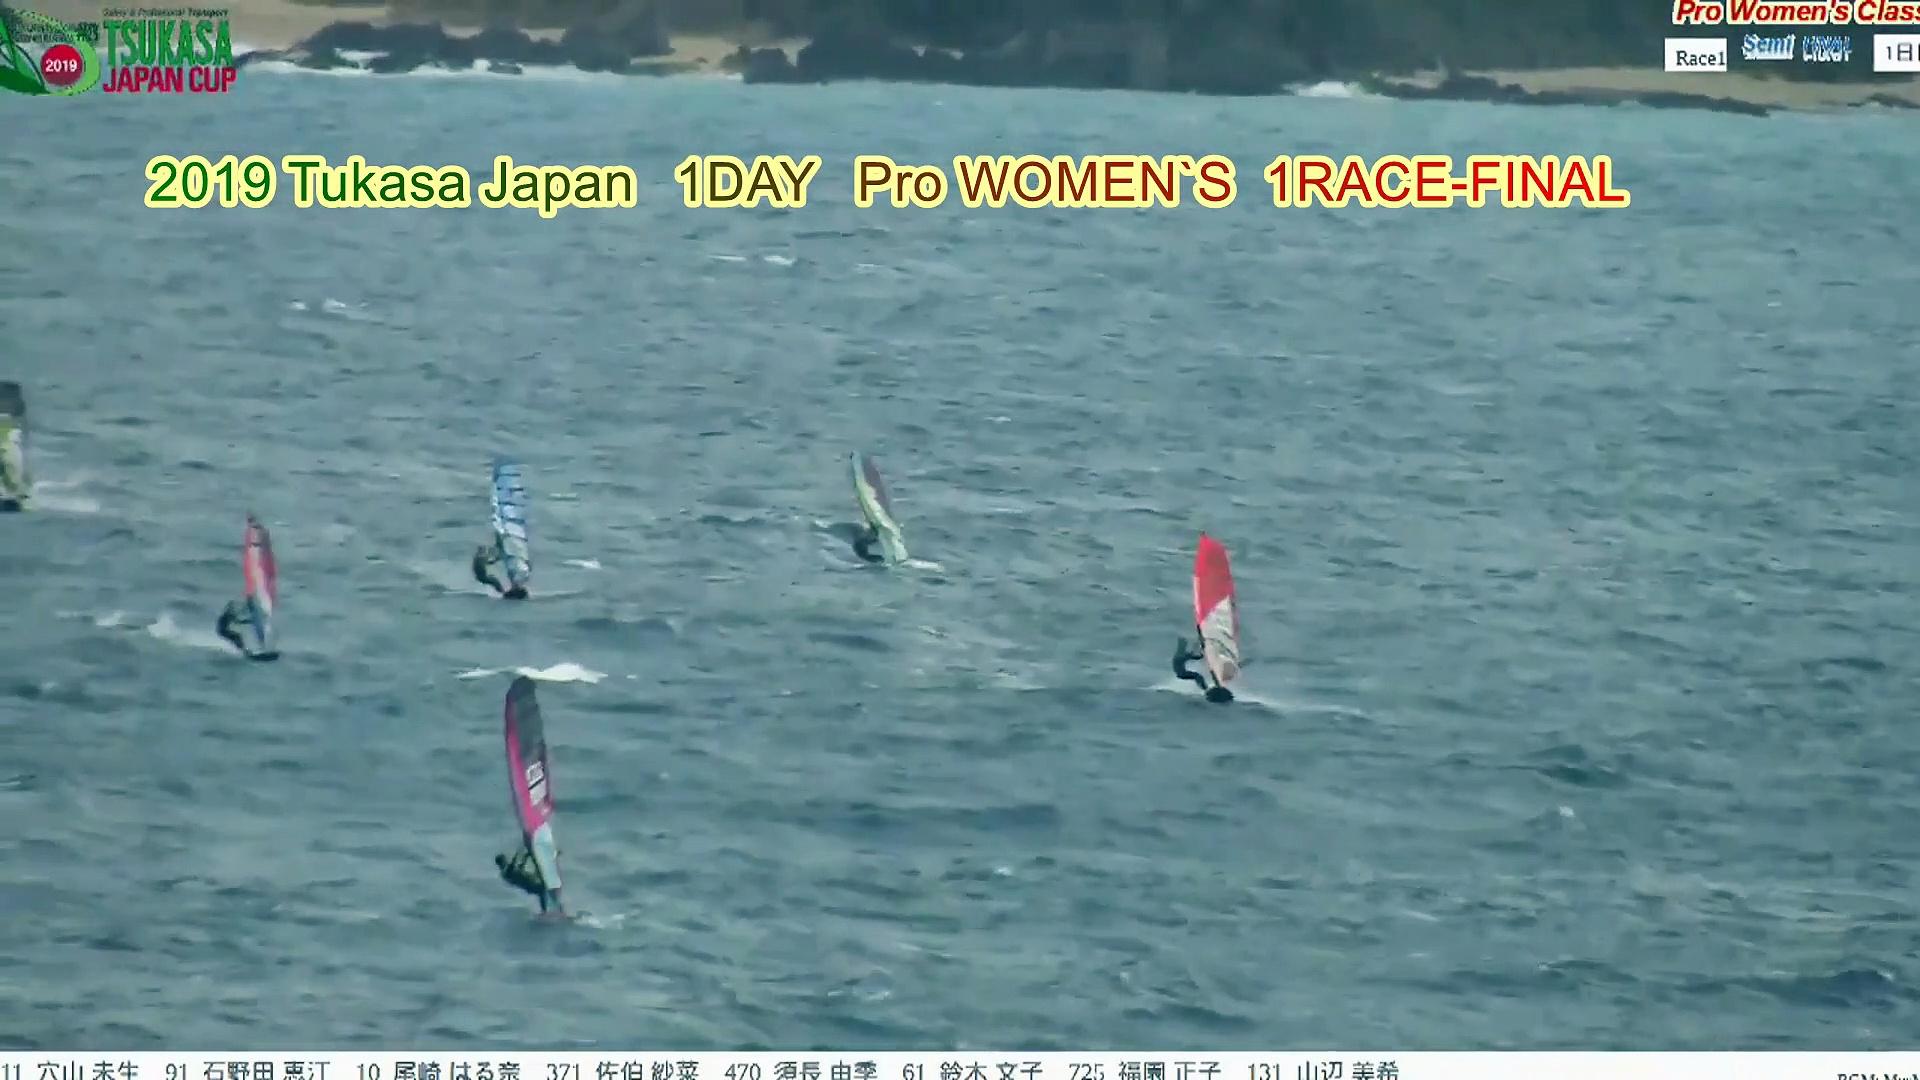 2019 Tukasa Japan CUP  Pro Women's  1DAY 1RACE-FINAL